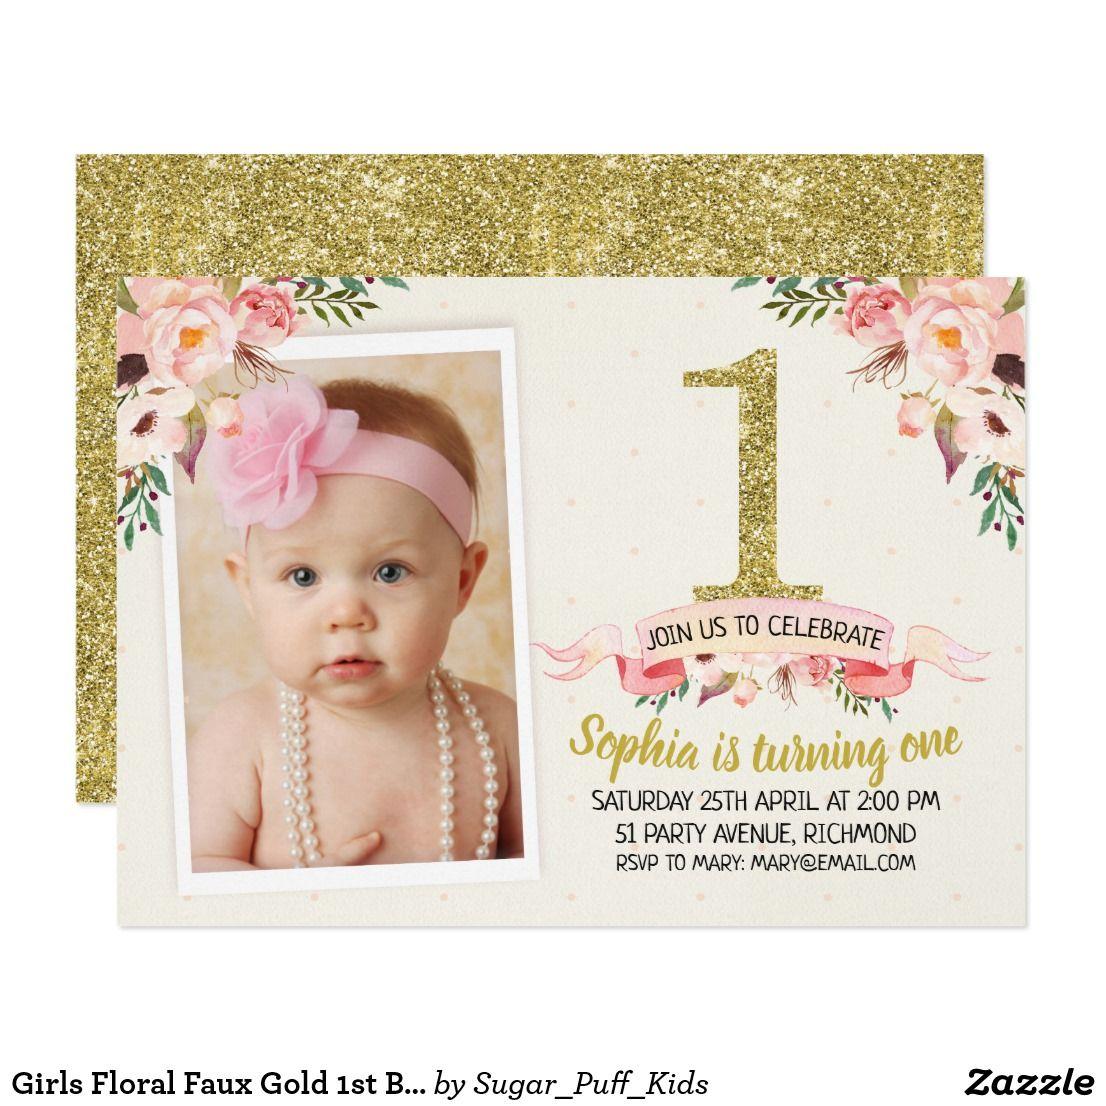 Girls Floral Faux Gold 1st Birthday Invitation | First Birthday ...